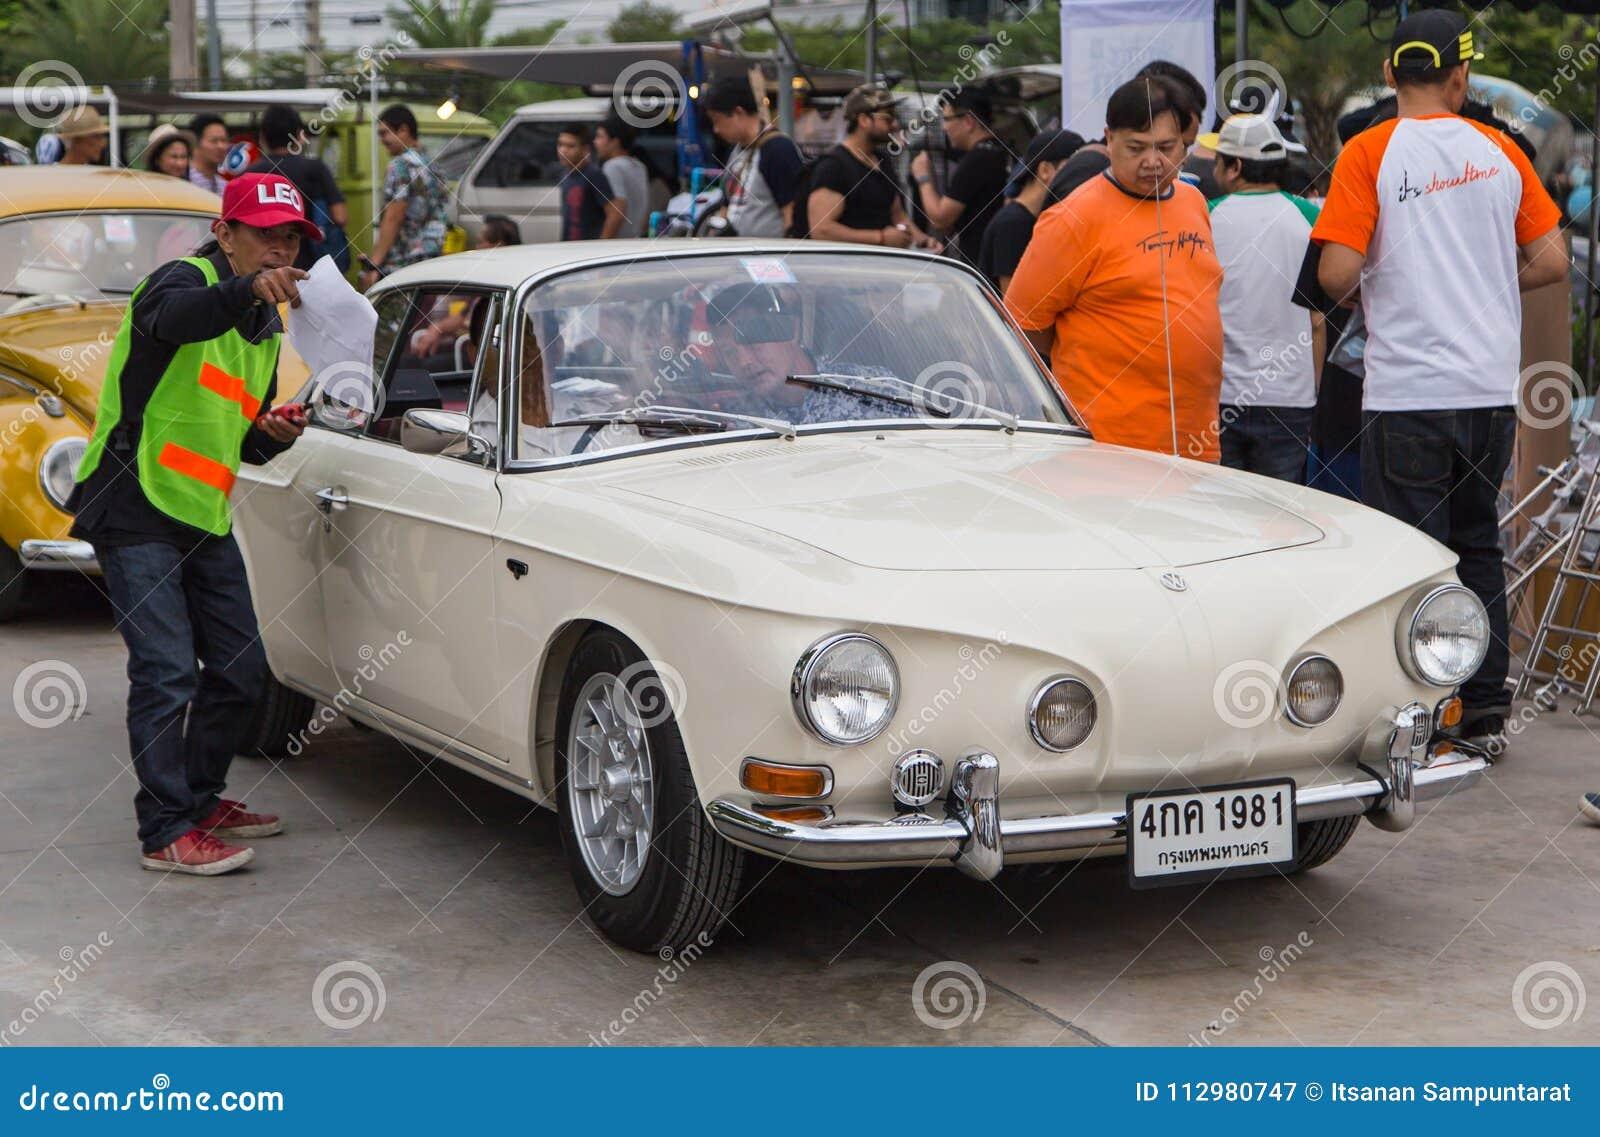 VW Karmann Ghia Type 34 join VW club meeting